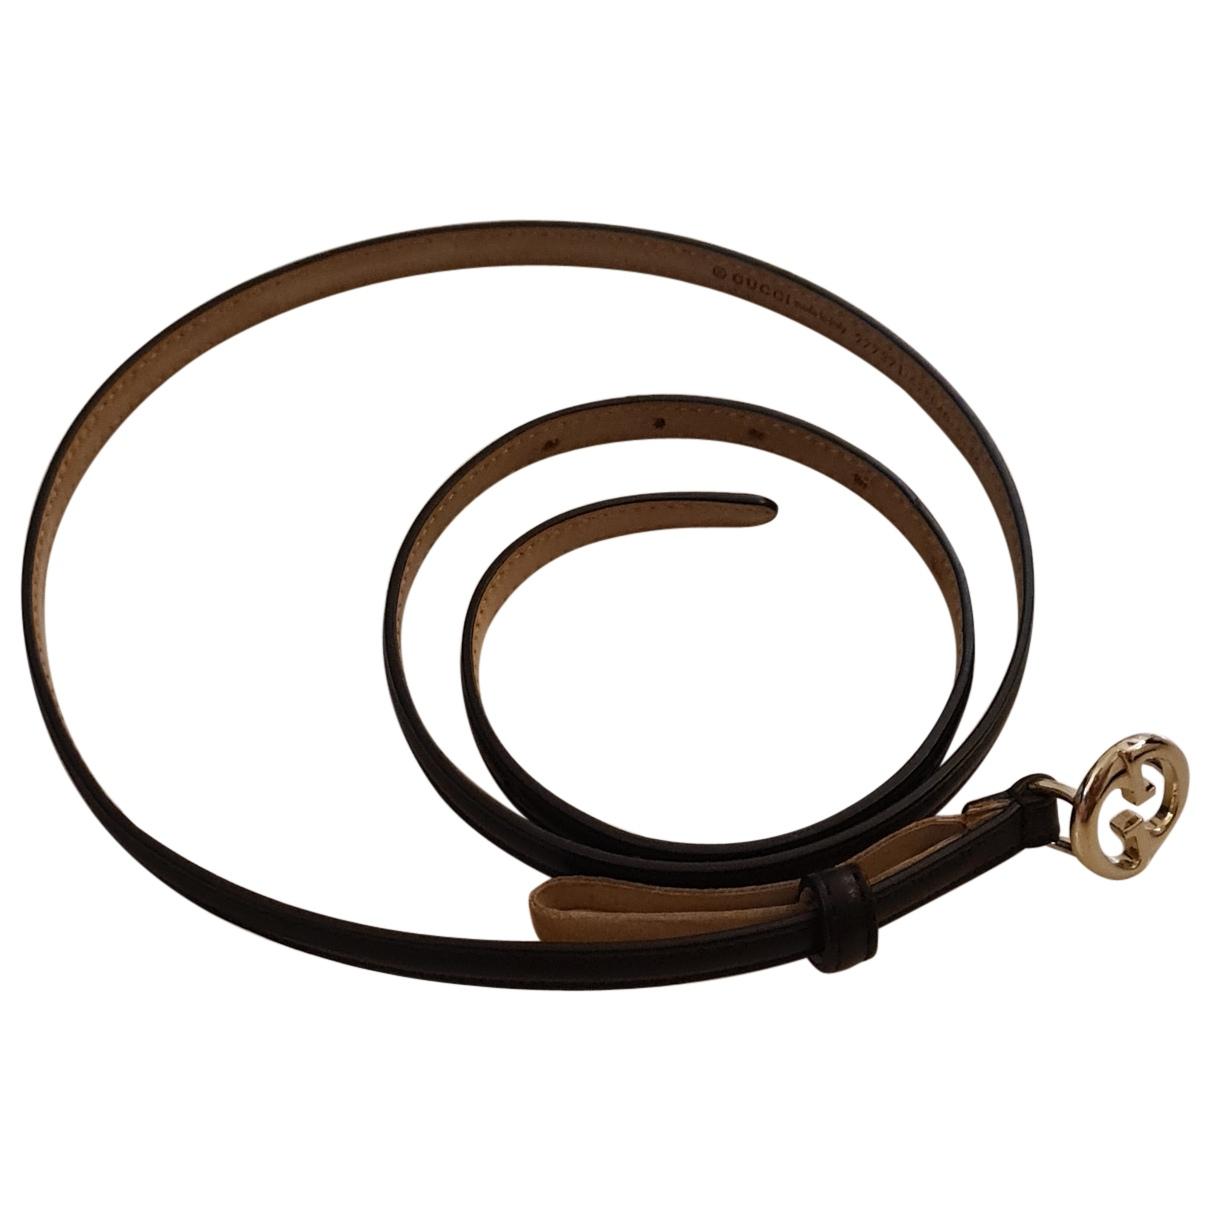 Gucci N Black Leather belt for Women 90 cm